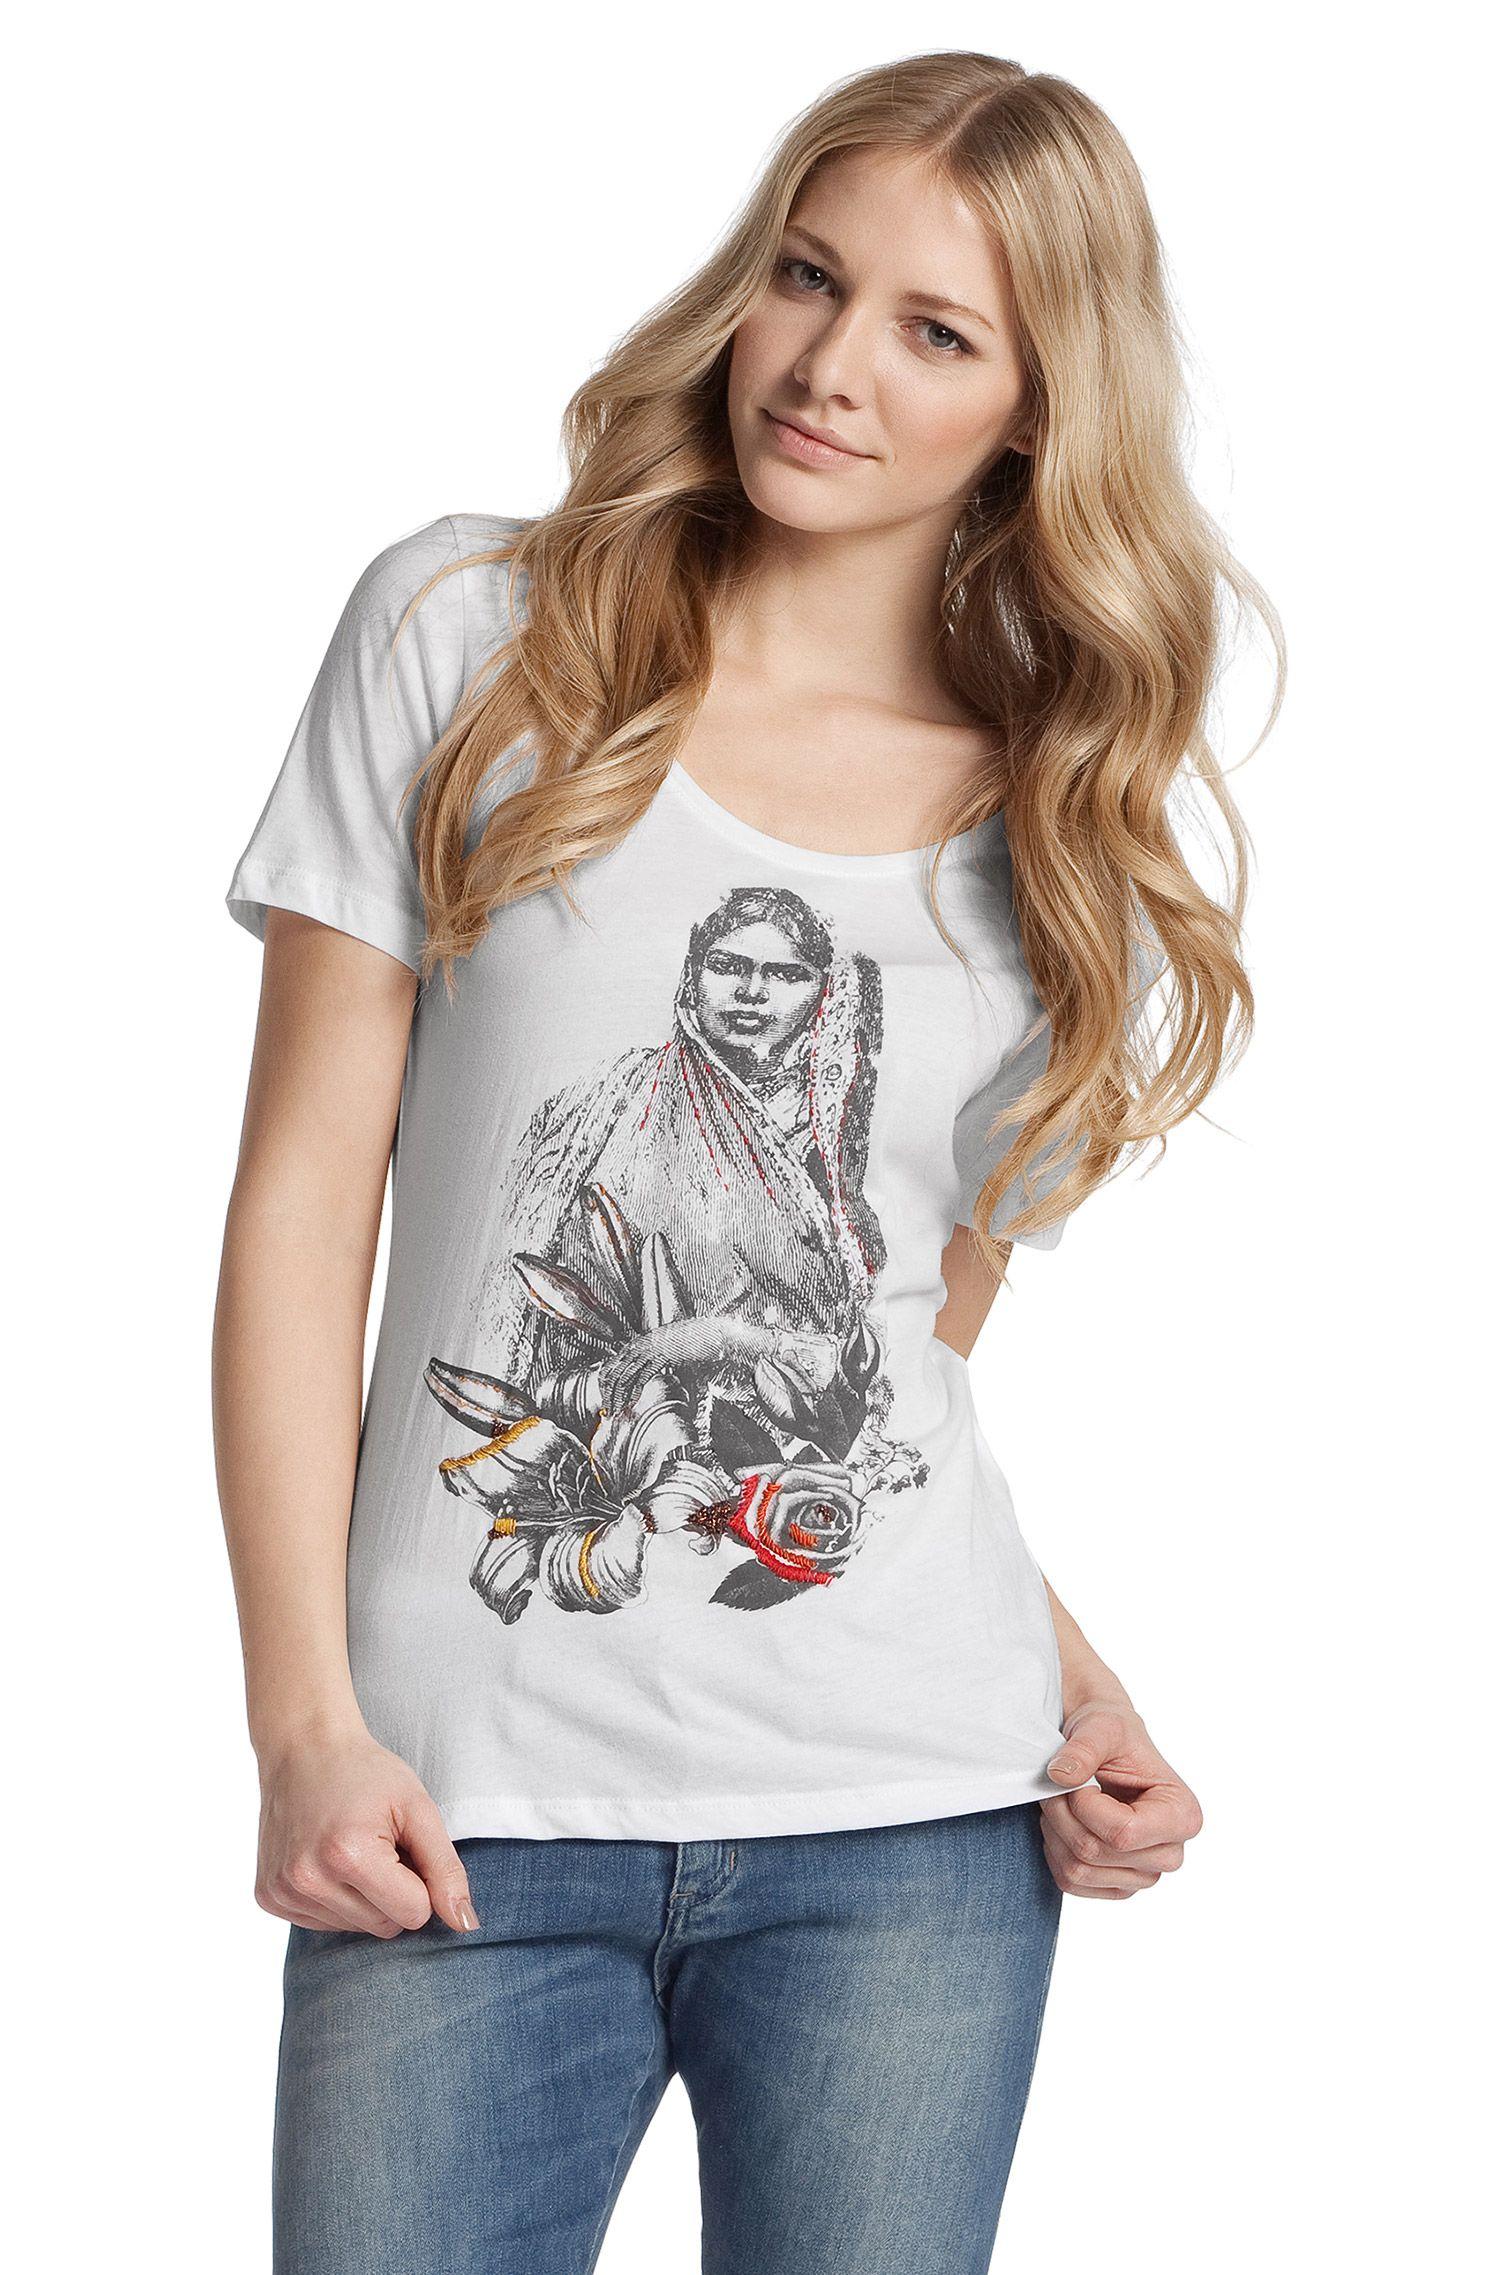 T-shirt à encolure ronde, Taimy